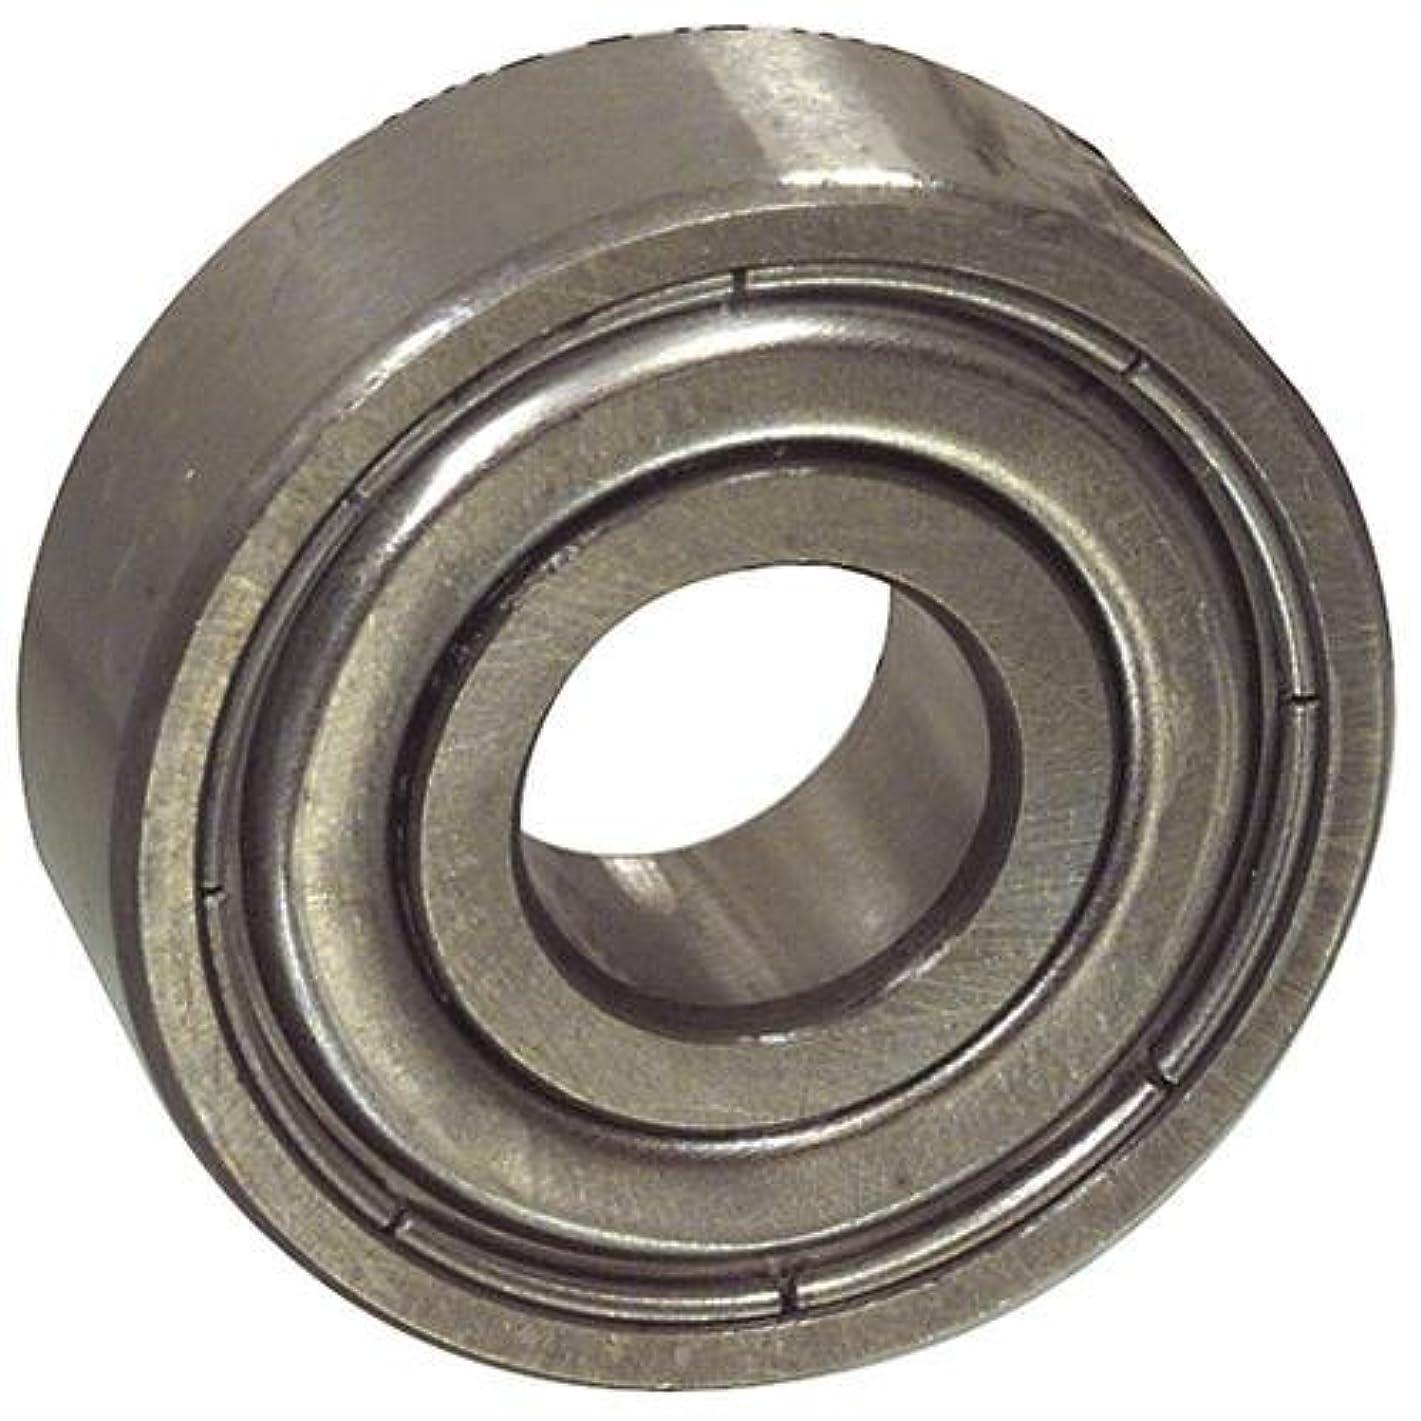 Whirlpool Ball bearing 6304 ZZ [W1-04518]